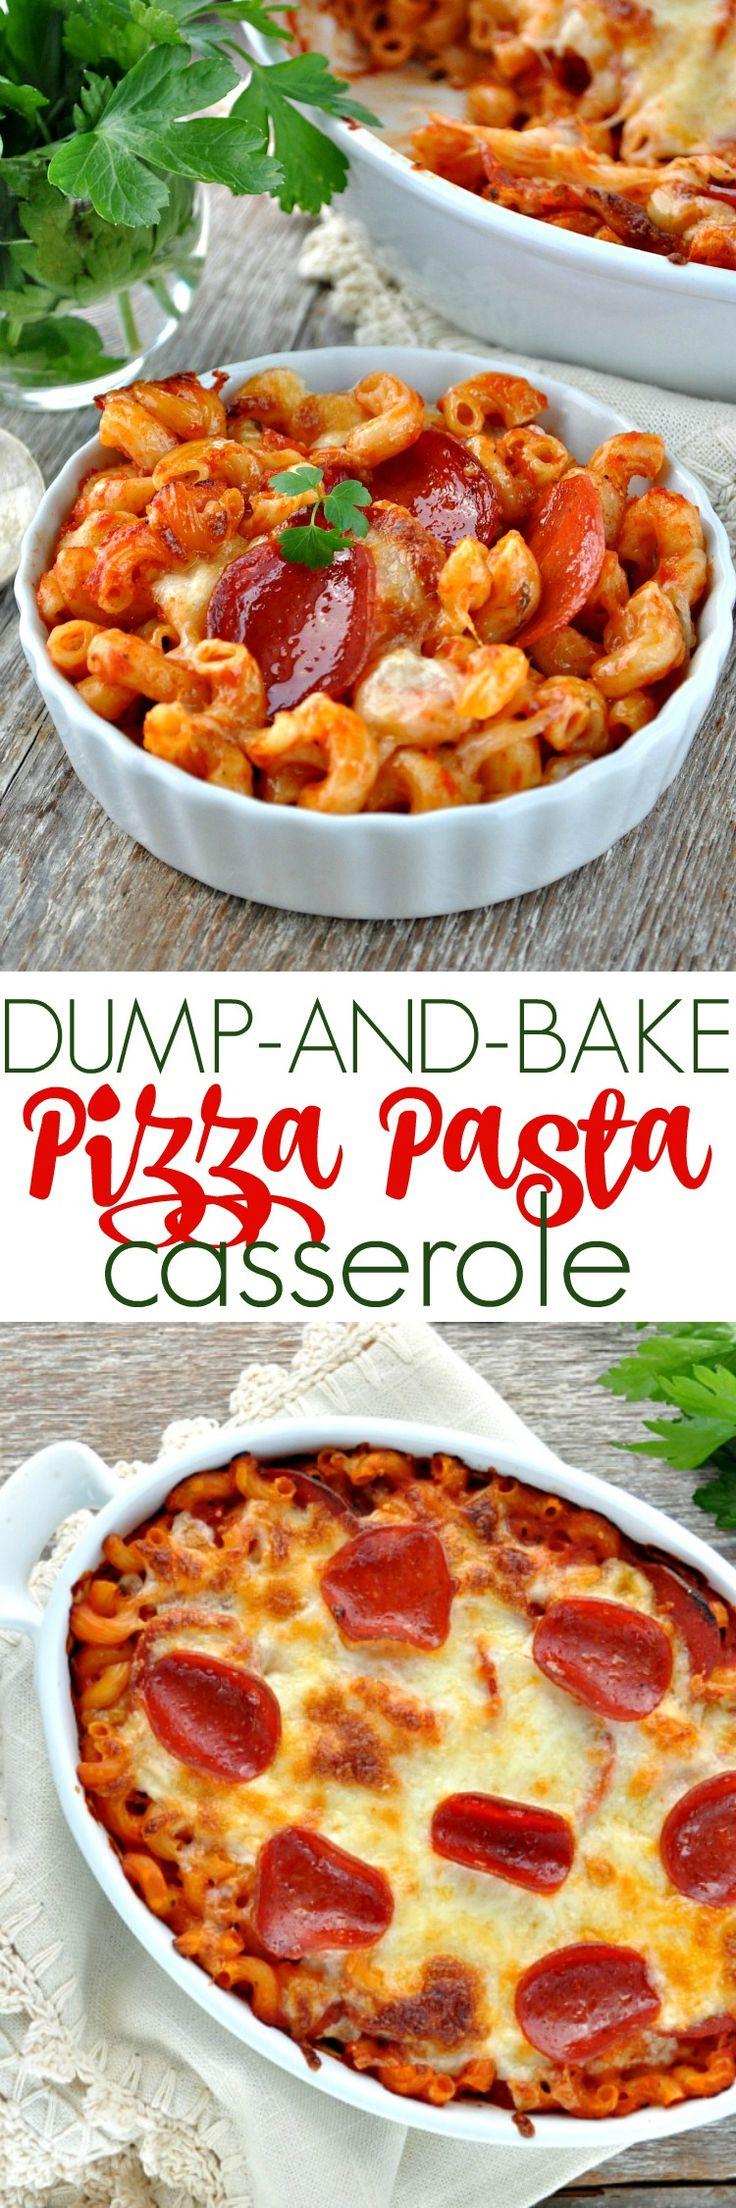 Dump and Bake Pizza Pasta Casserole - easy weeknight dinner idea